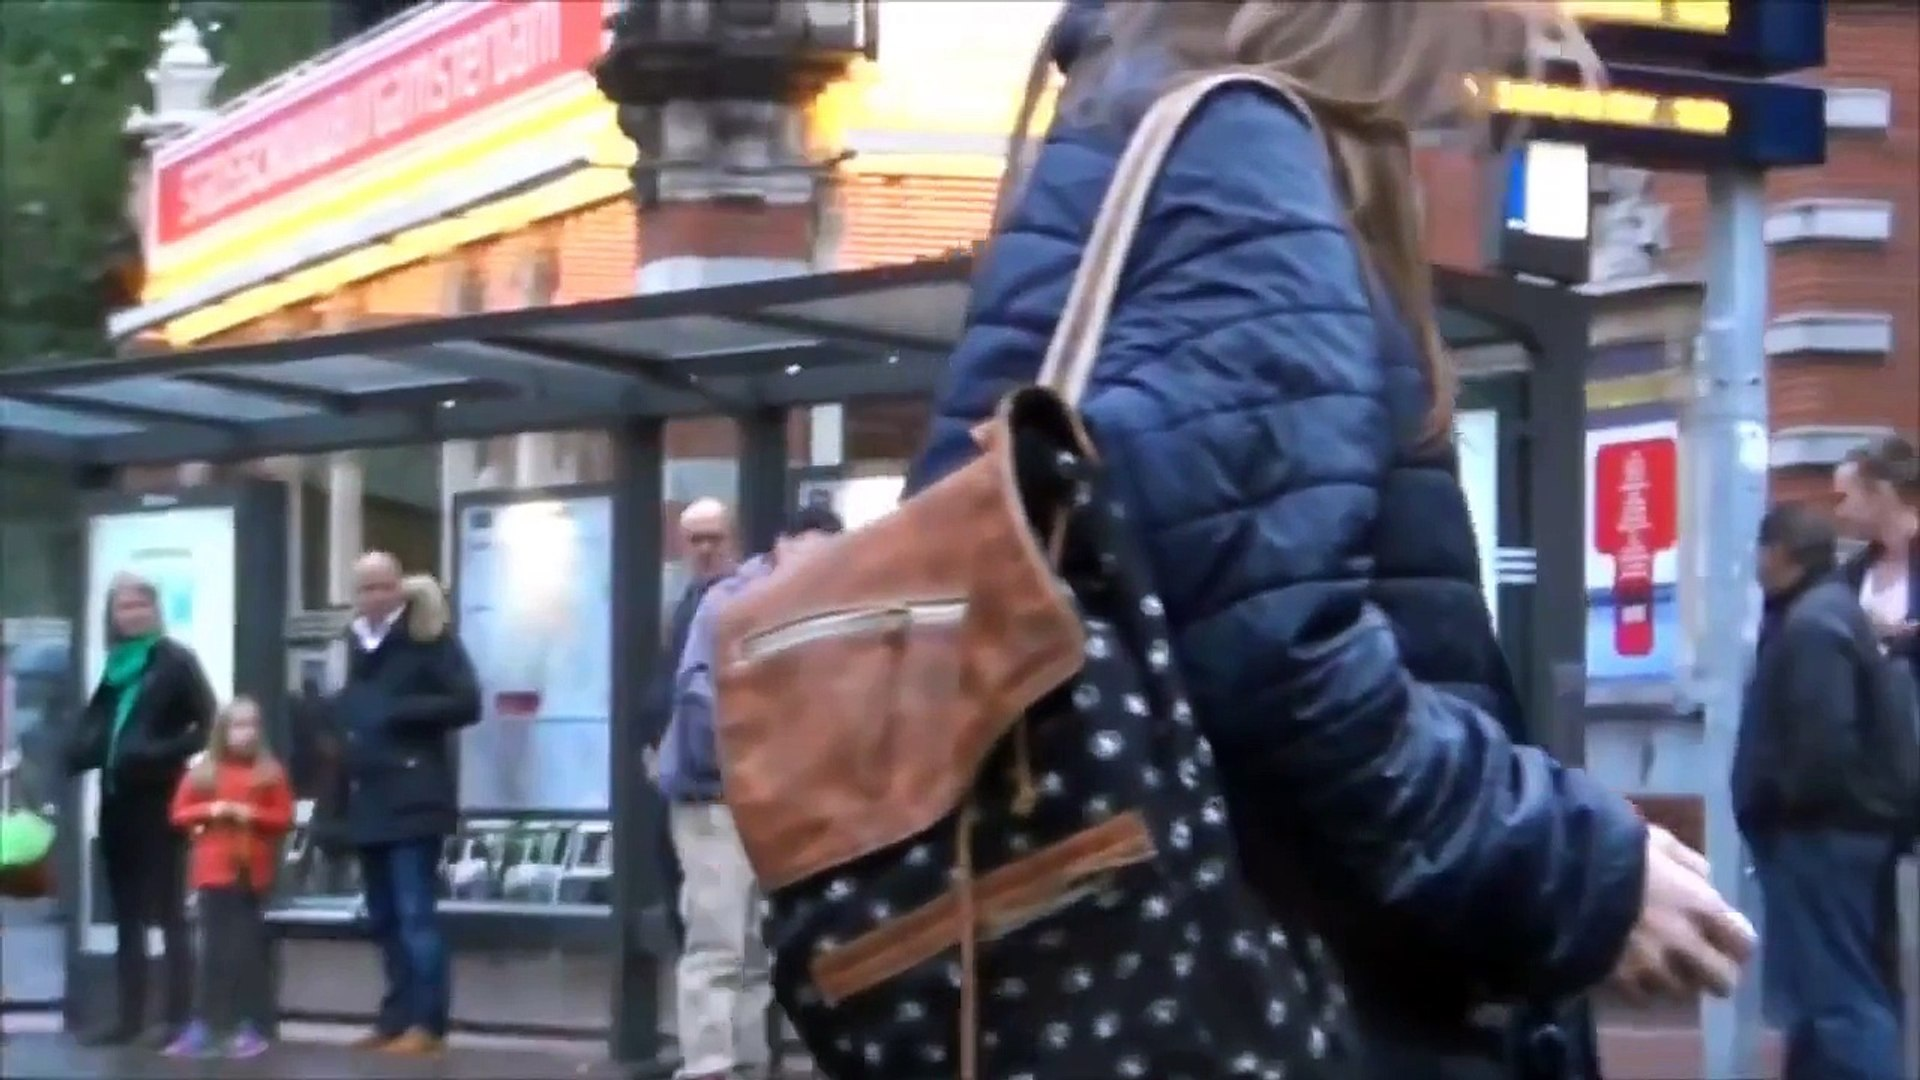 Funniest Pranks in Amsterdam (TourdePrank) Pranks on People Funny Videos Best Pranks 2014